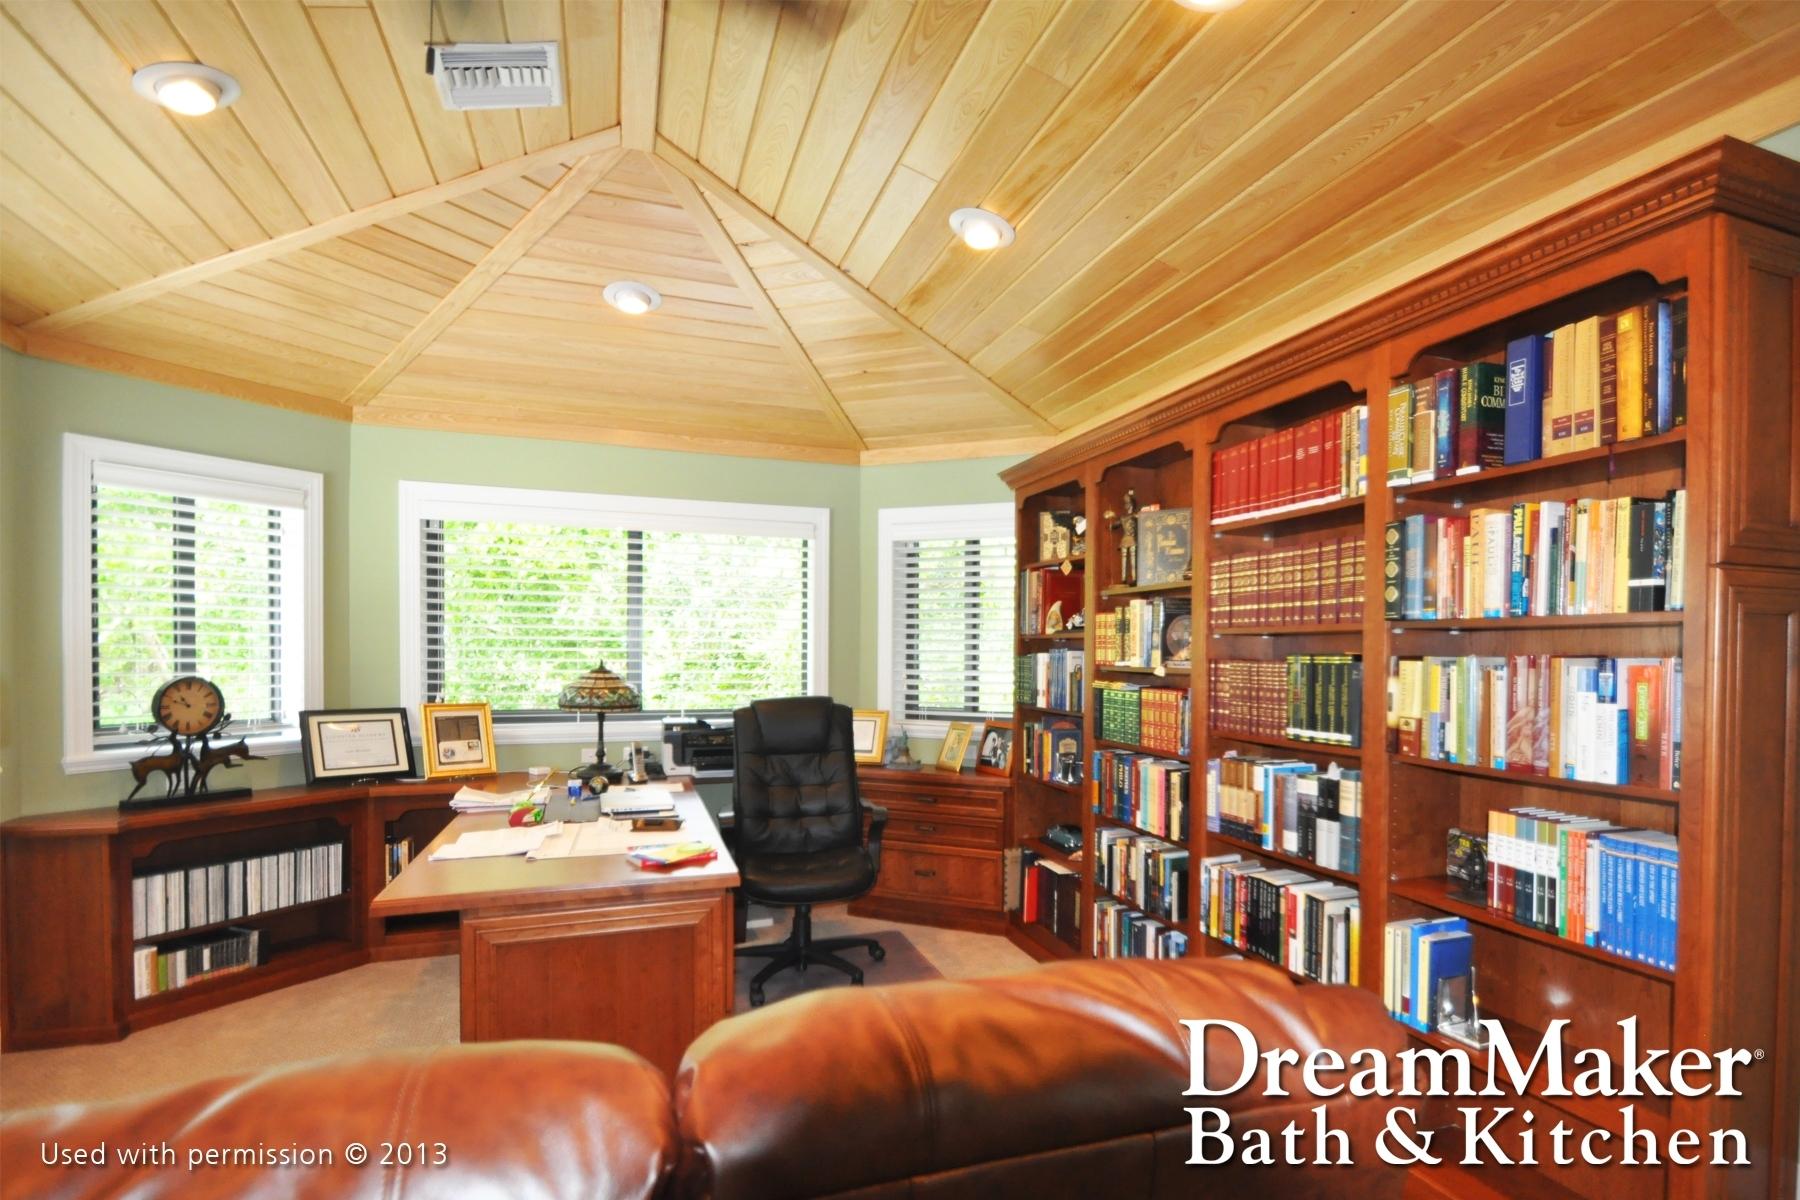 Blog | Dreammaker Bath & Kitchen Of Orland Park intended for Kitchen Remodeling Orland Park Il